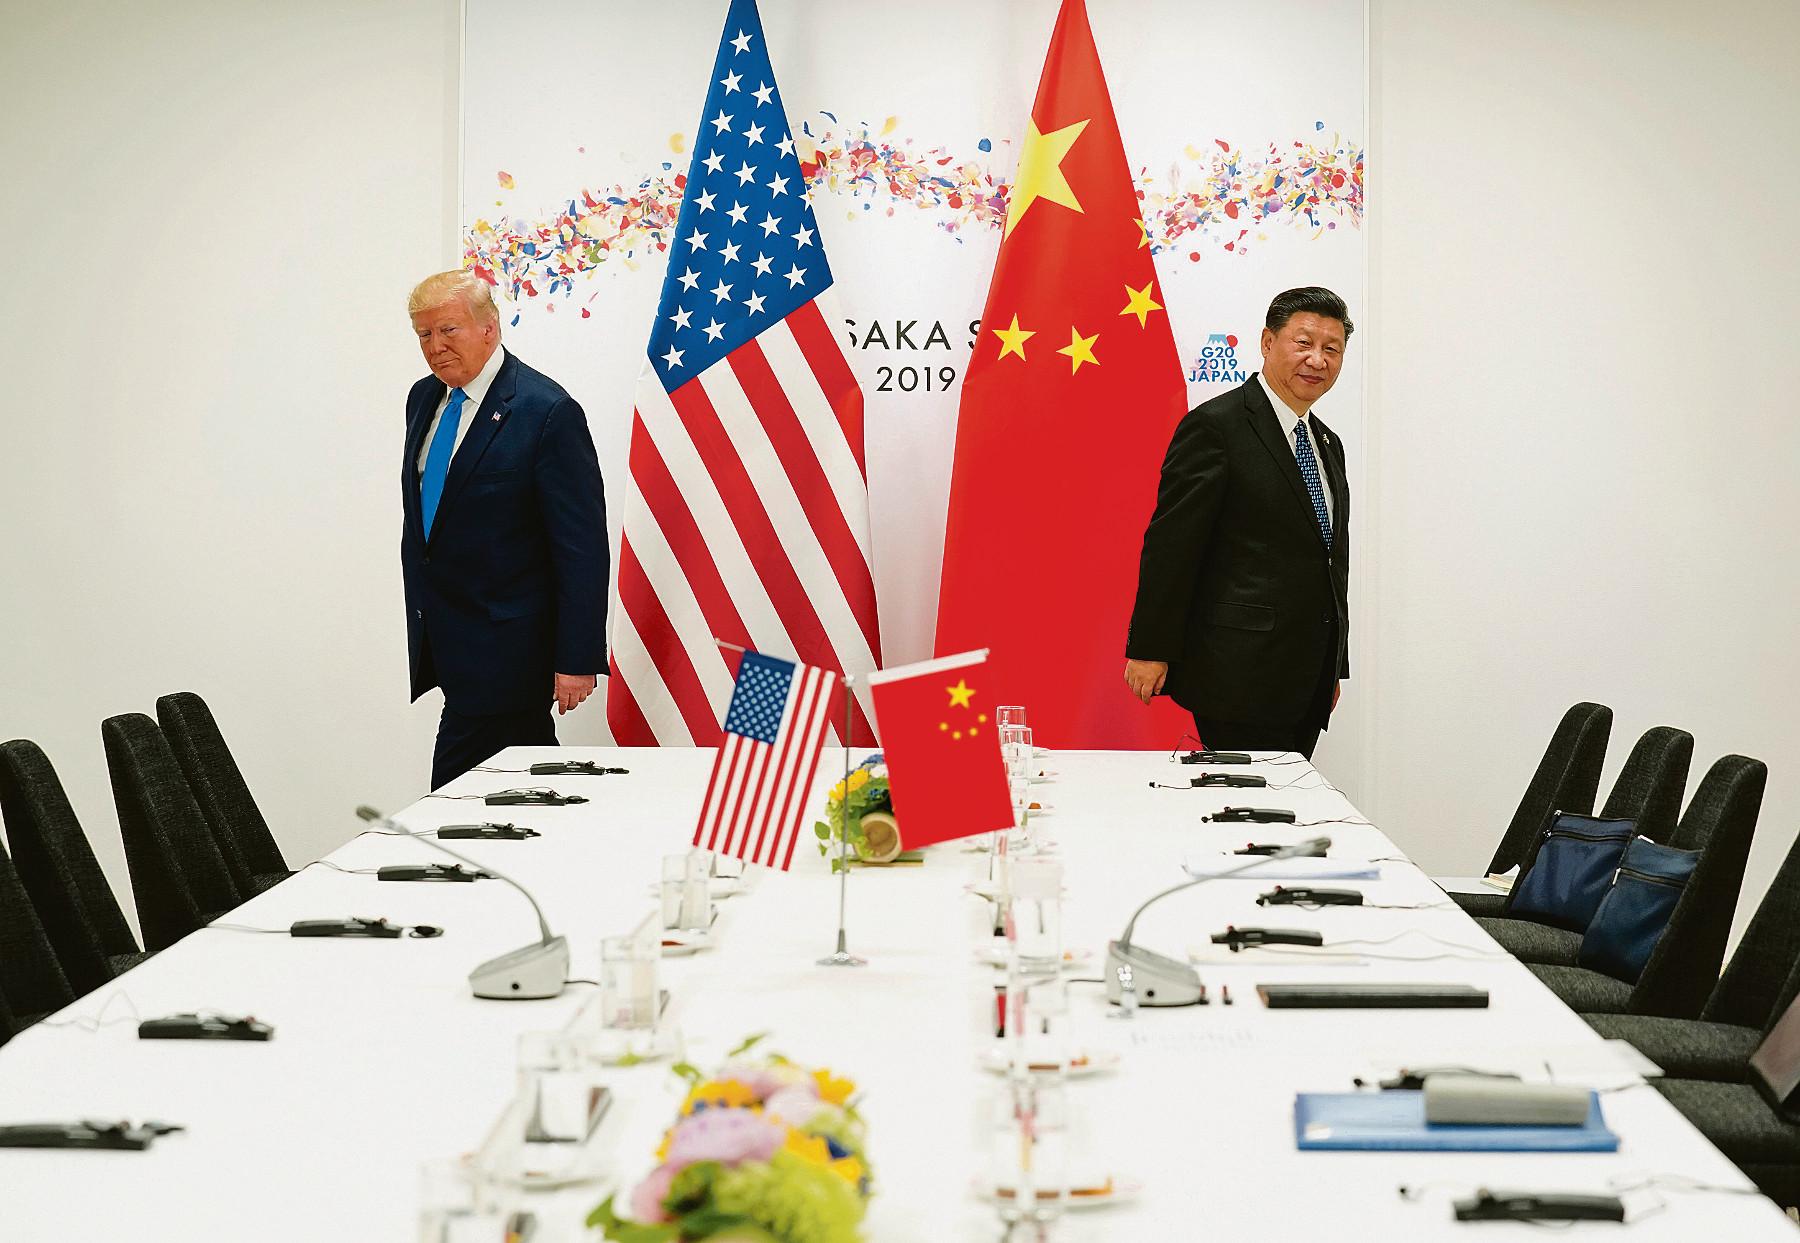 Američki predsjednik Donald Trump i kineski lider Xi Jinping